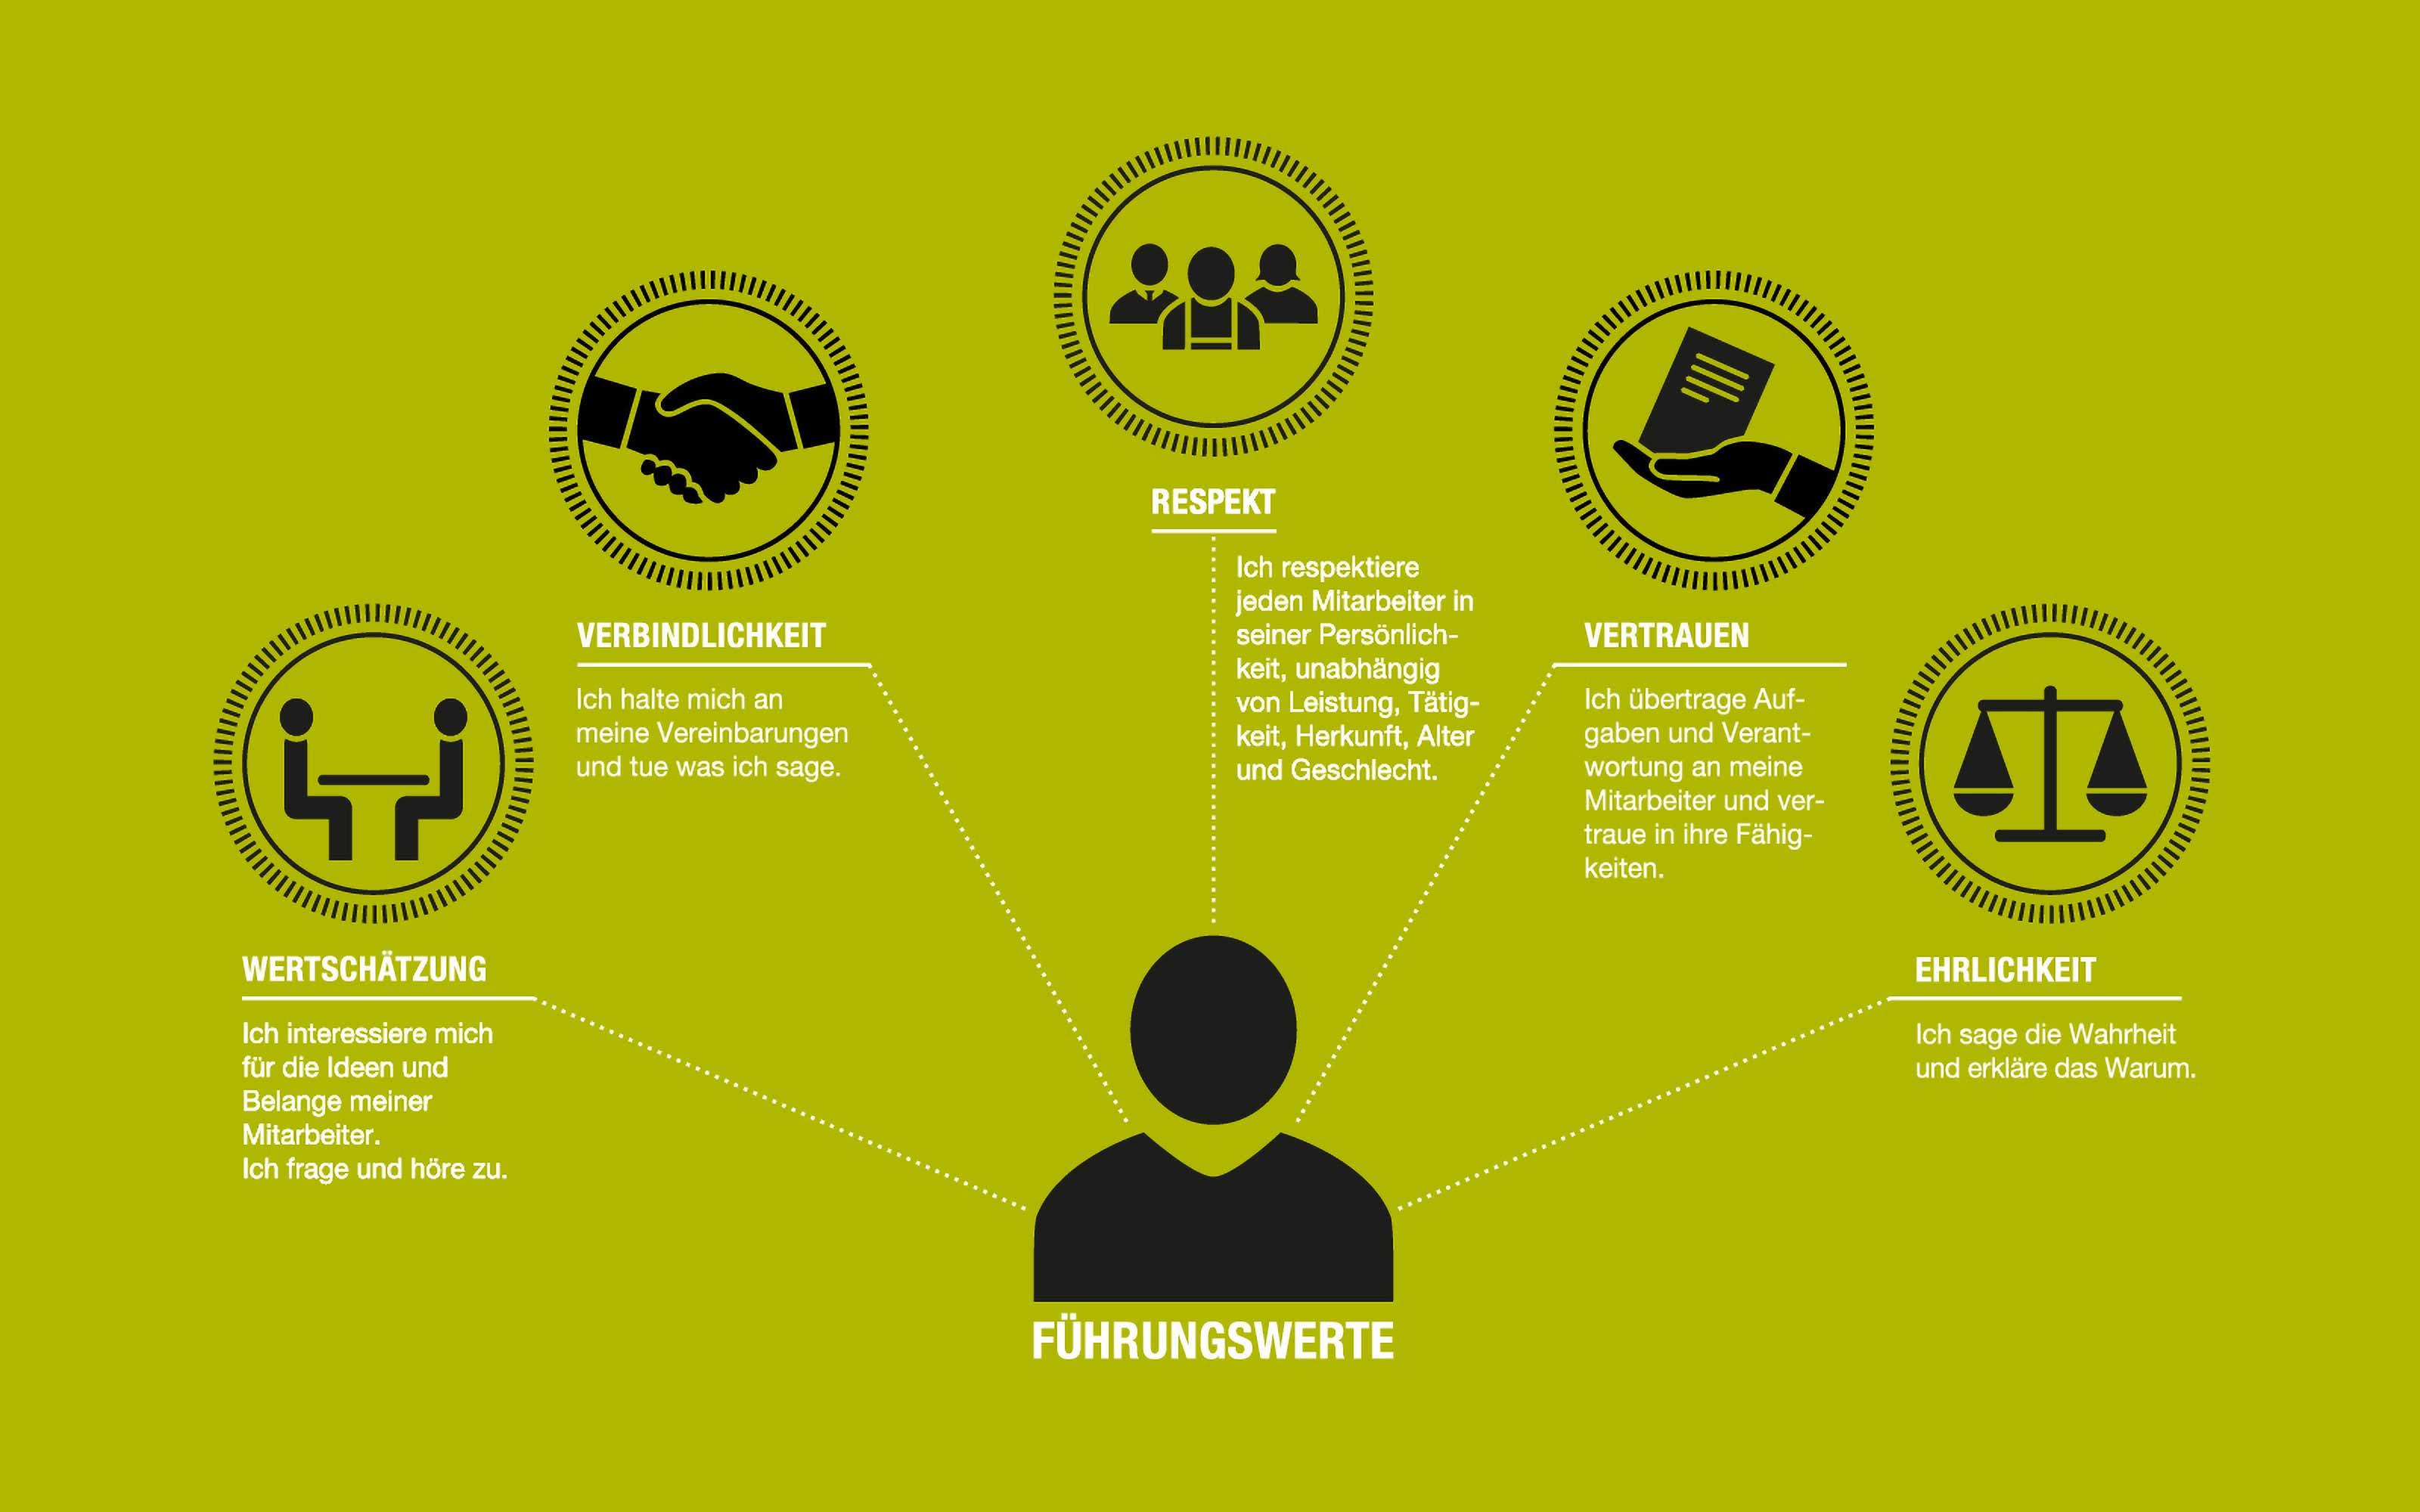 Leitbildvisualisierung Infografik